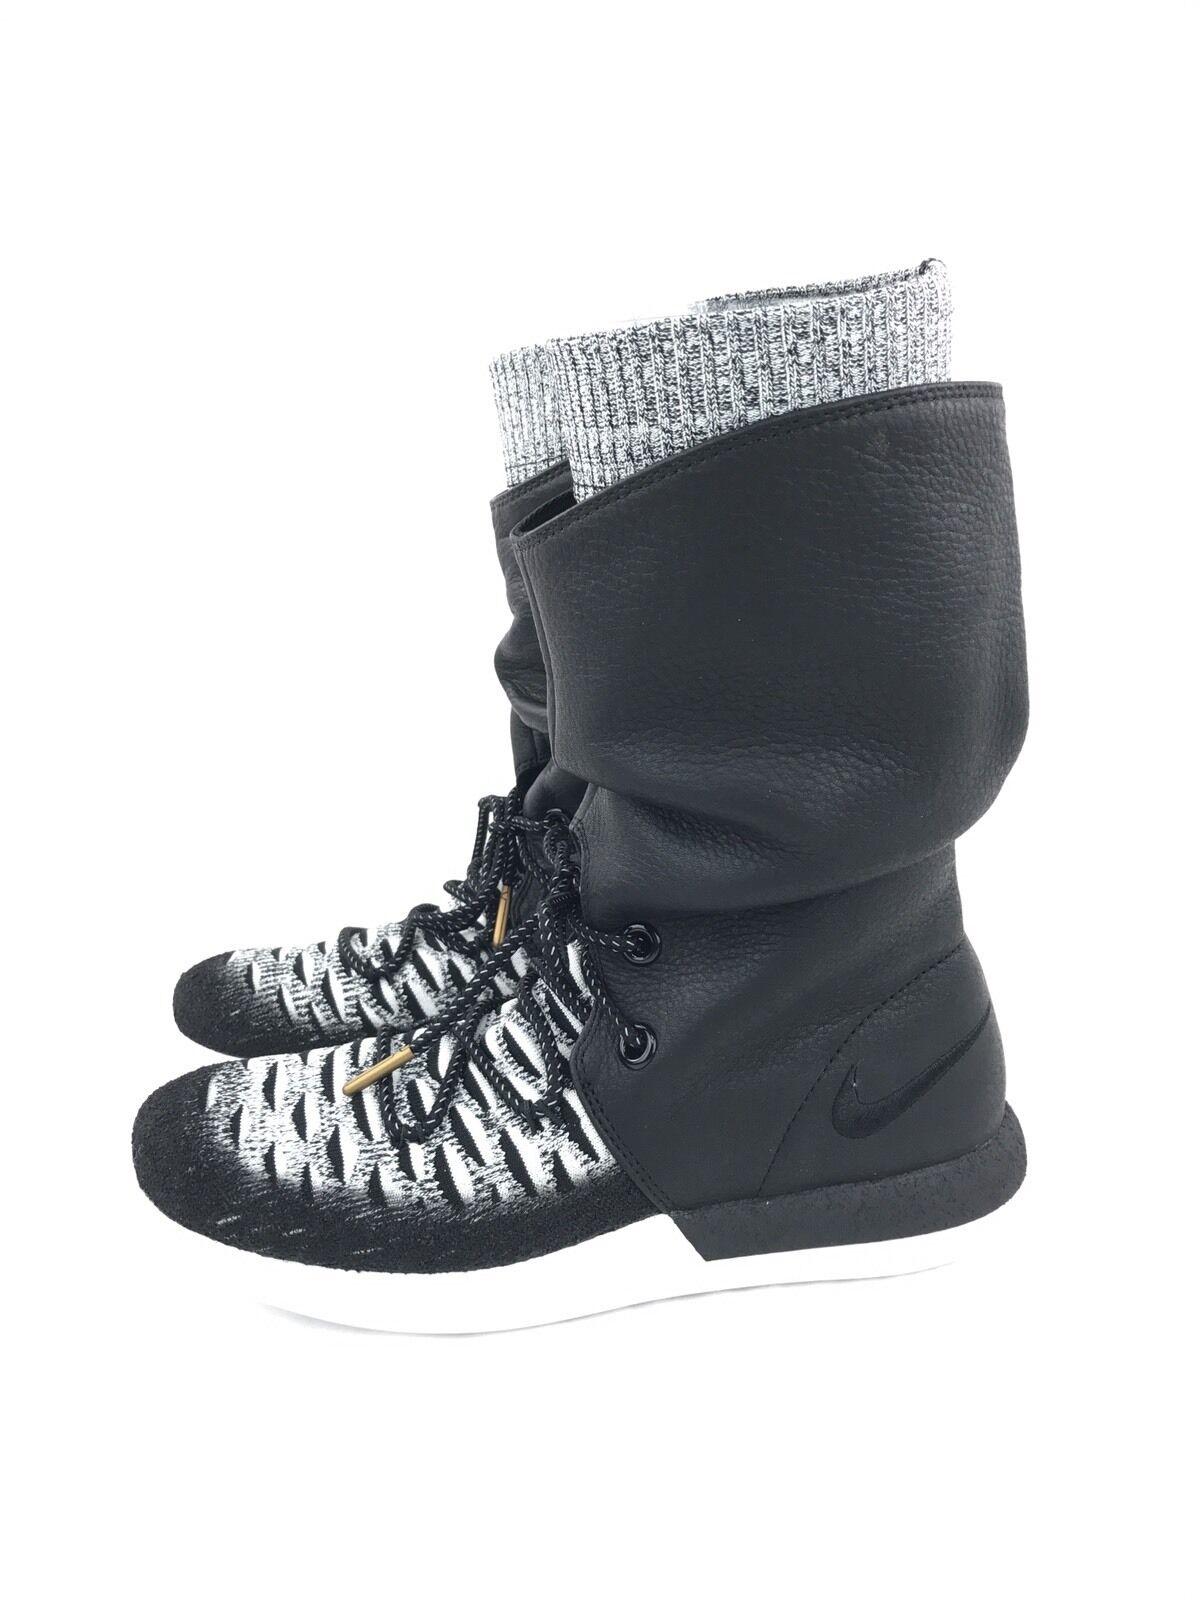 Womens Nike Roshe Two Hi Flyknit 2 Hi Top Black Women Boots 861708-002 S 7 NEW